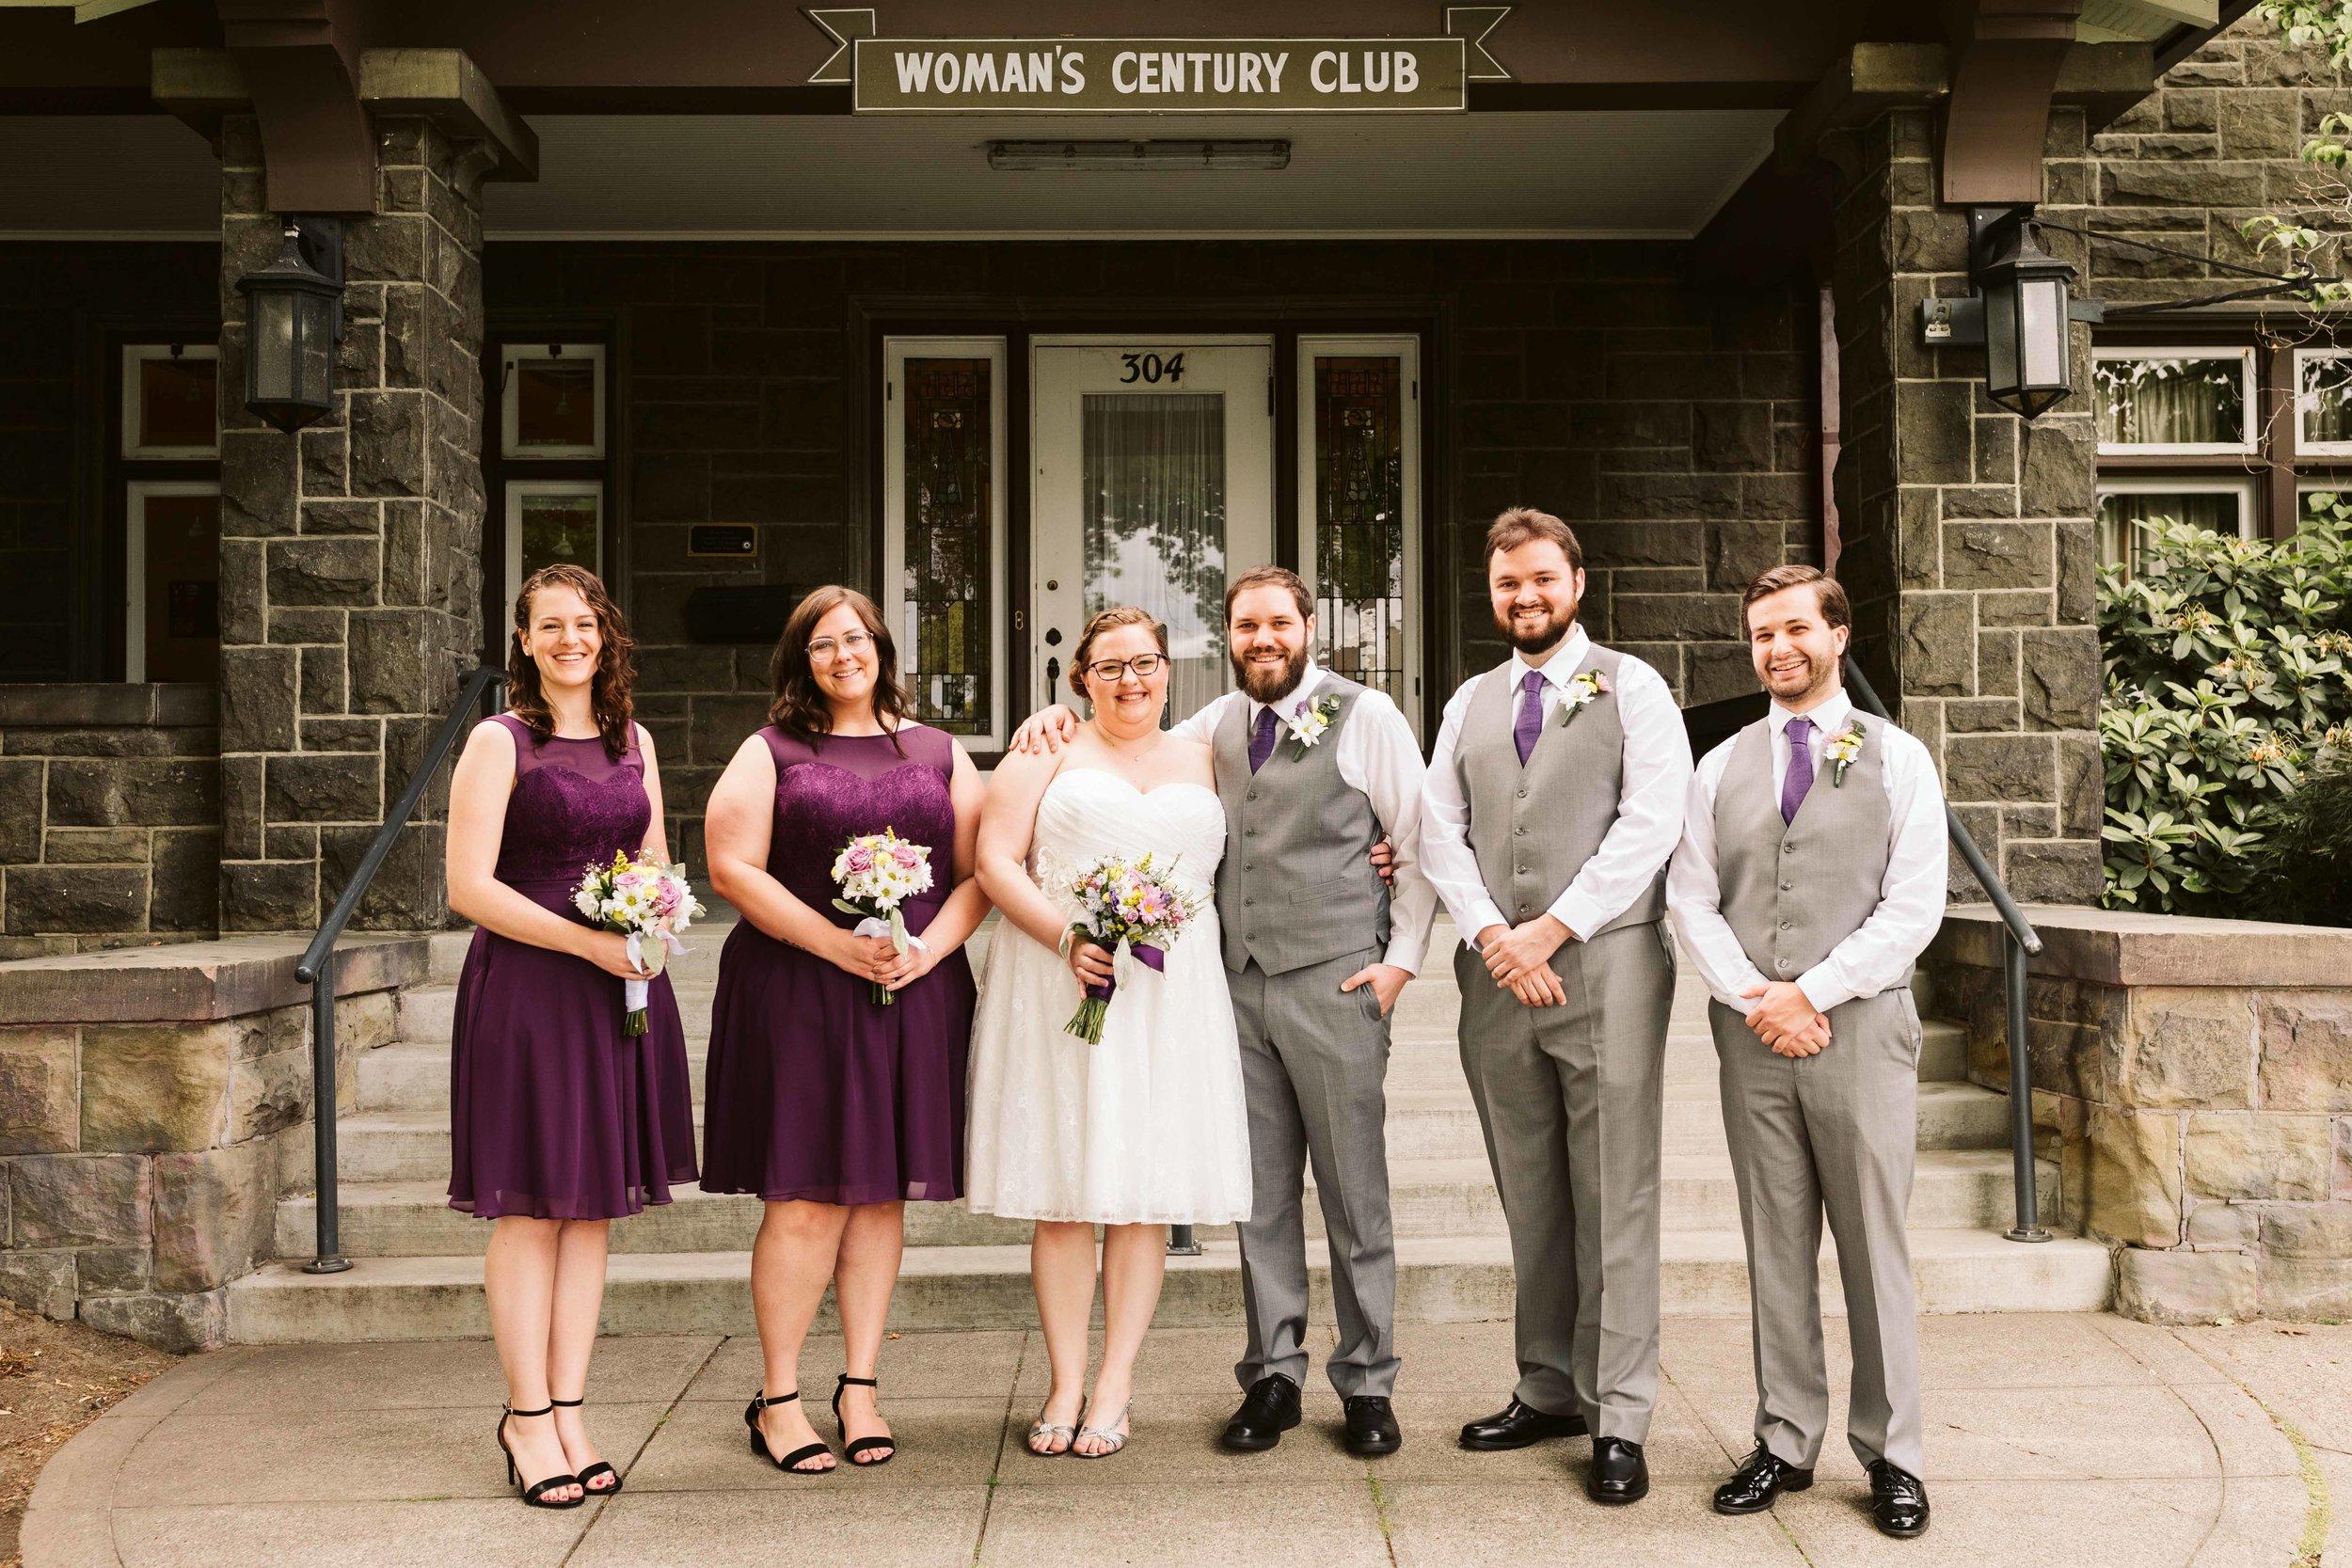 womens-century-club-wedding-36.jpg